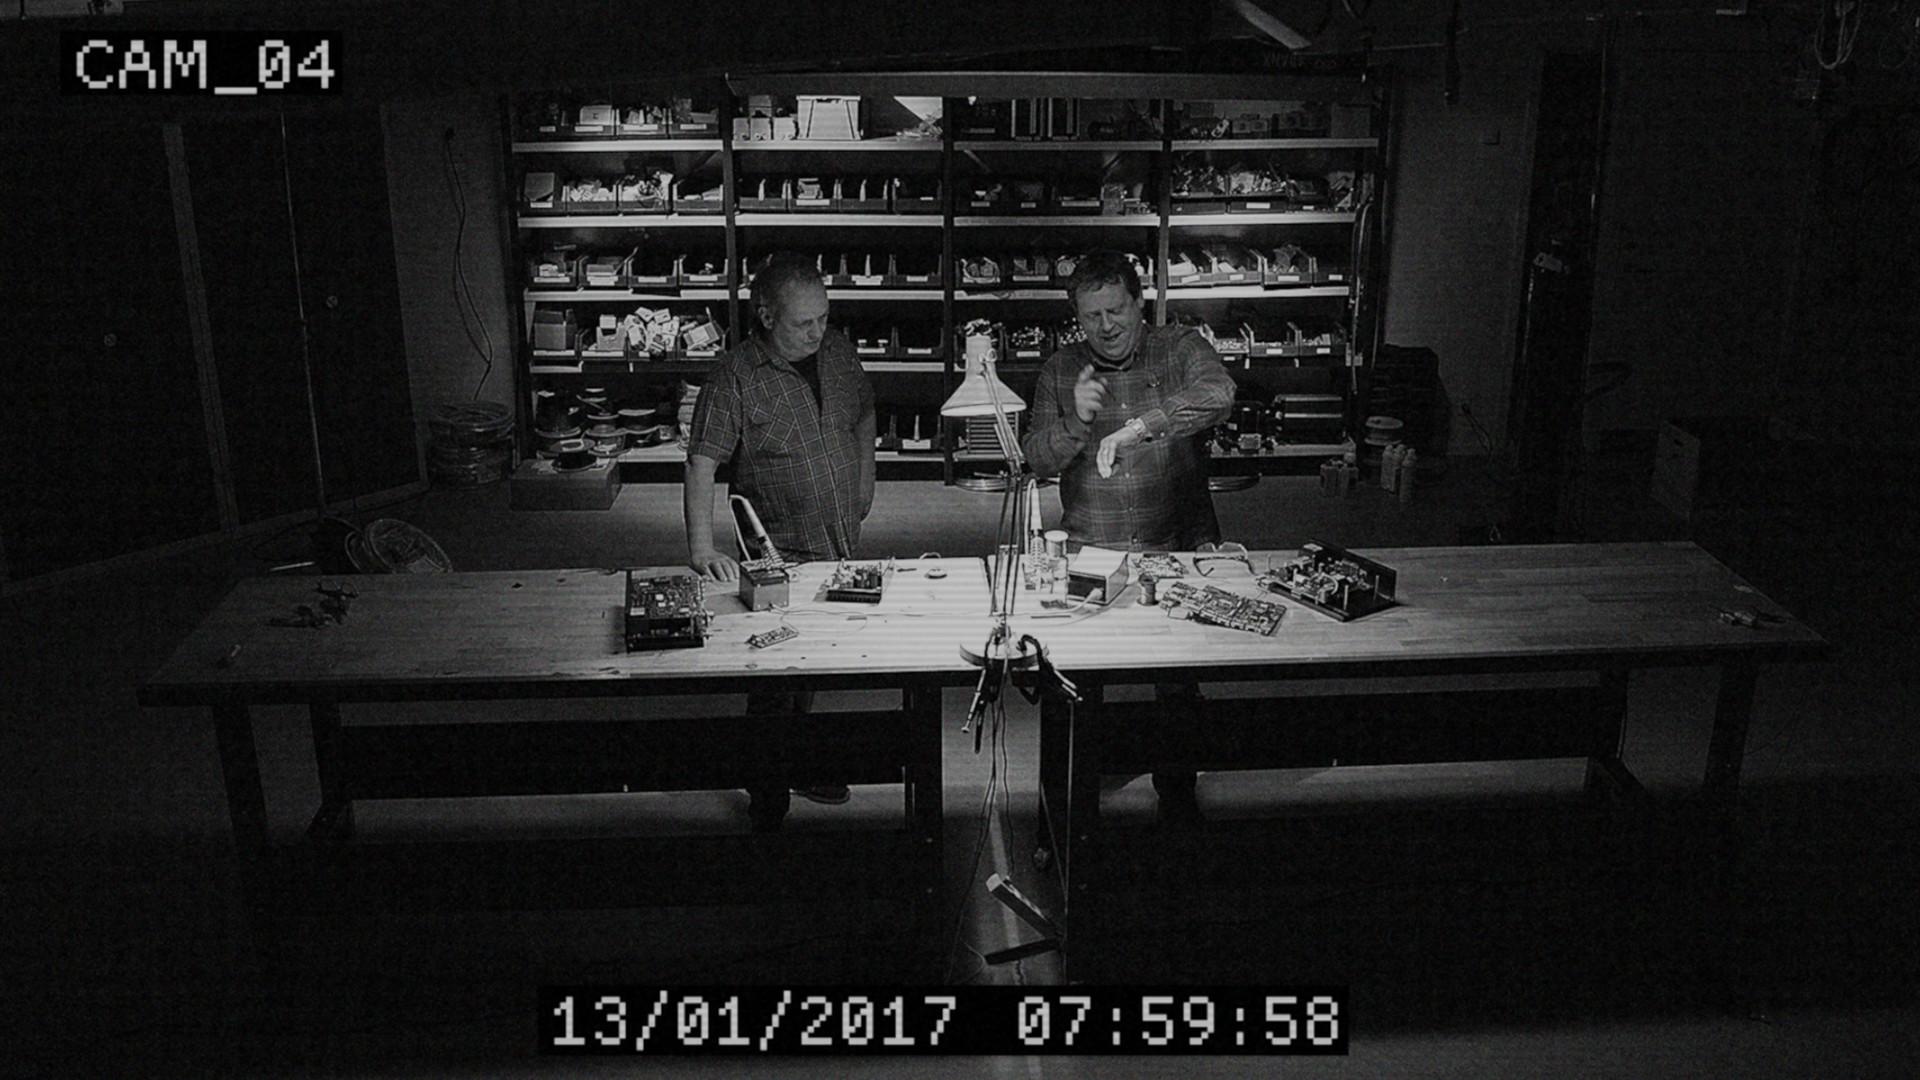 Gustav berg pedersen lysfilm 1ste gennemklip 00 00 05 01 still004